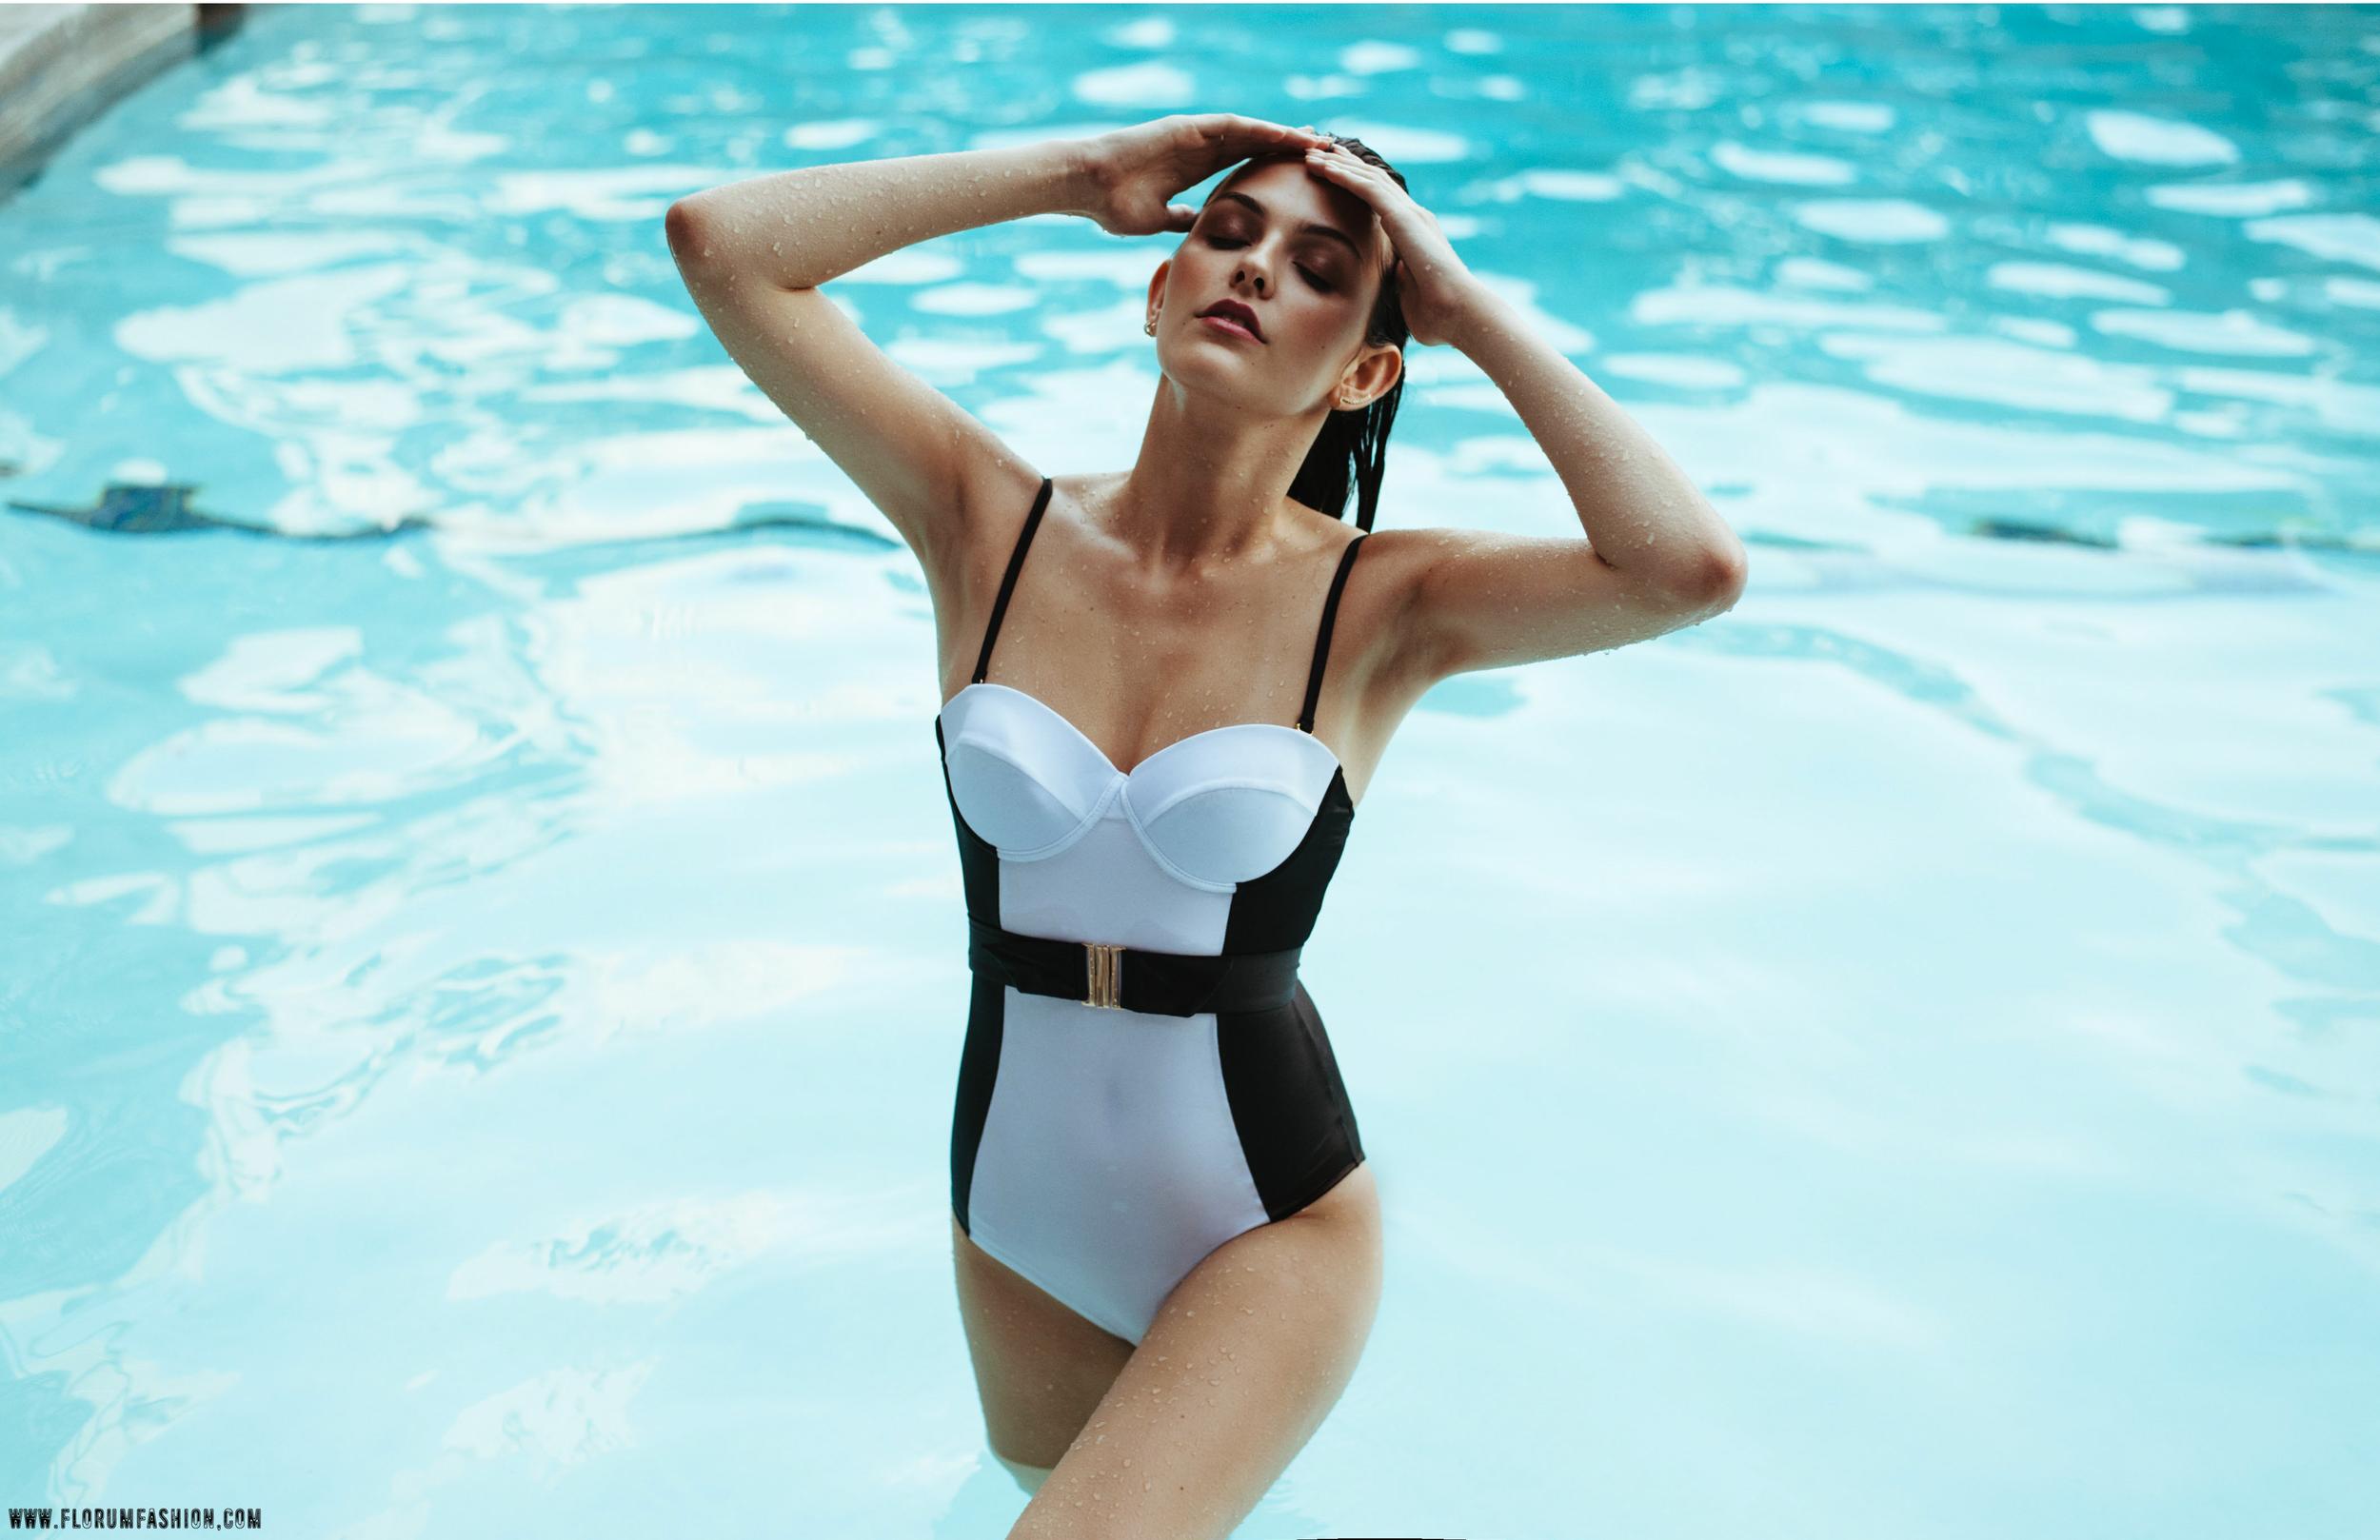 Charlotte Elizabeth Clough Luxury Swimwear - Florum Fashion Magazine - Stephen Sun - Julia Friedman - Photogenics LA - Slow Fashion - Ethical Fashion - Green Swimsuits (2)